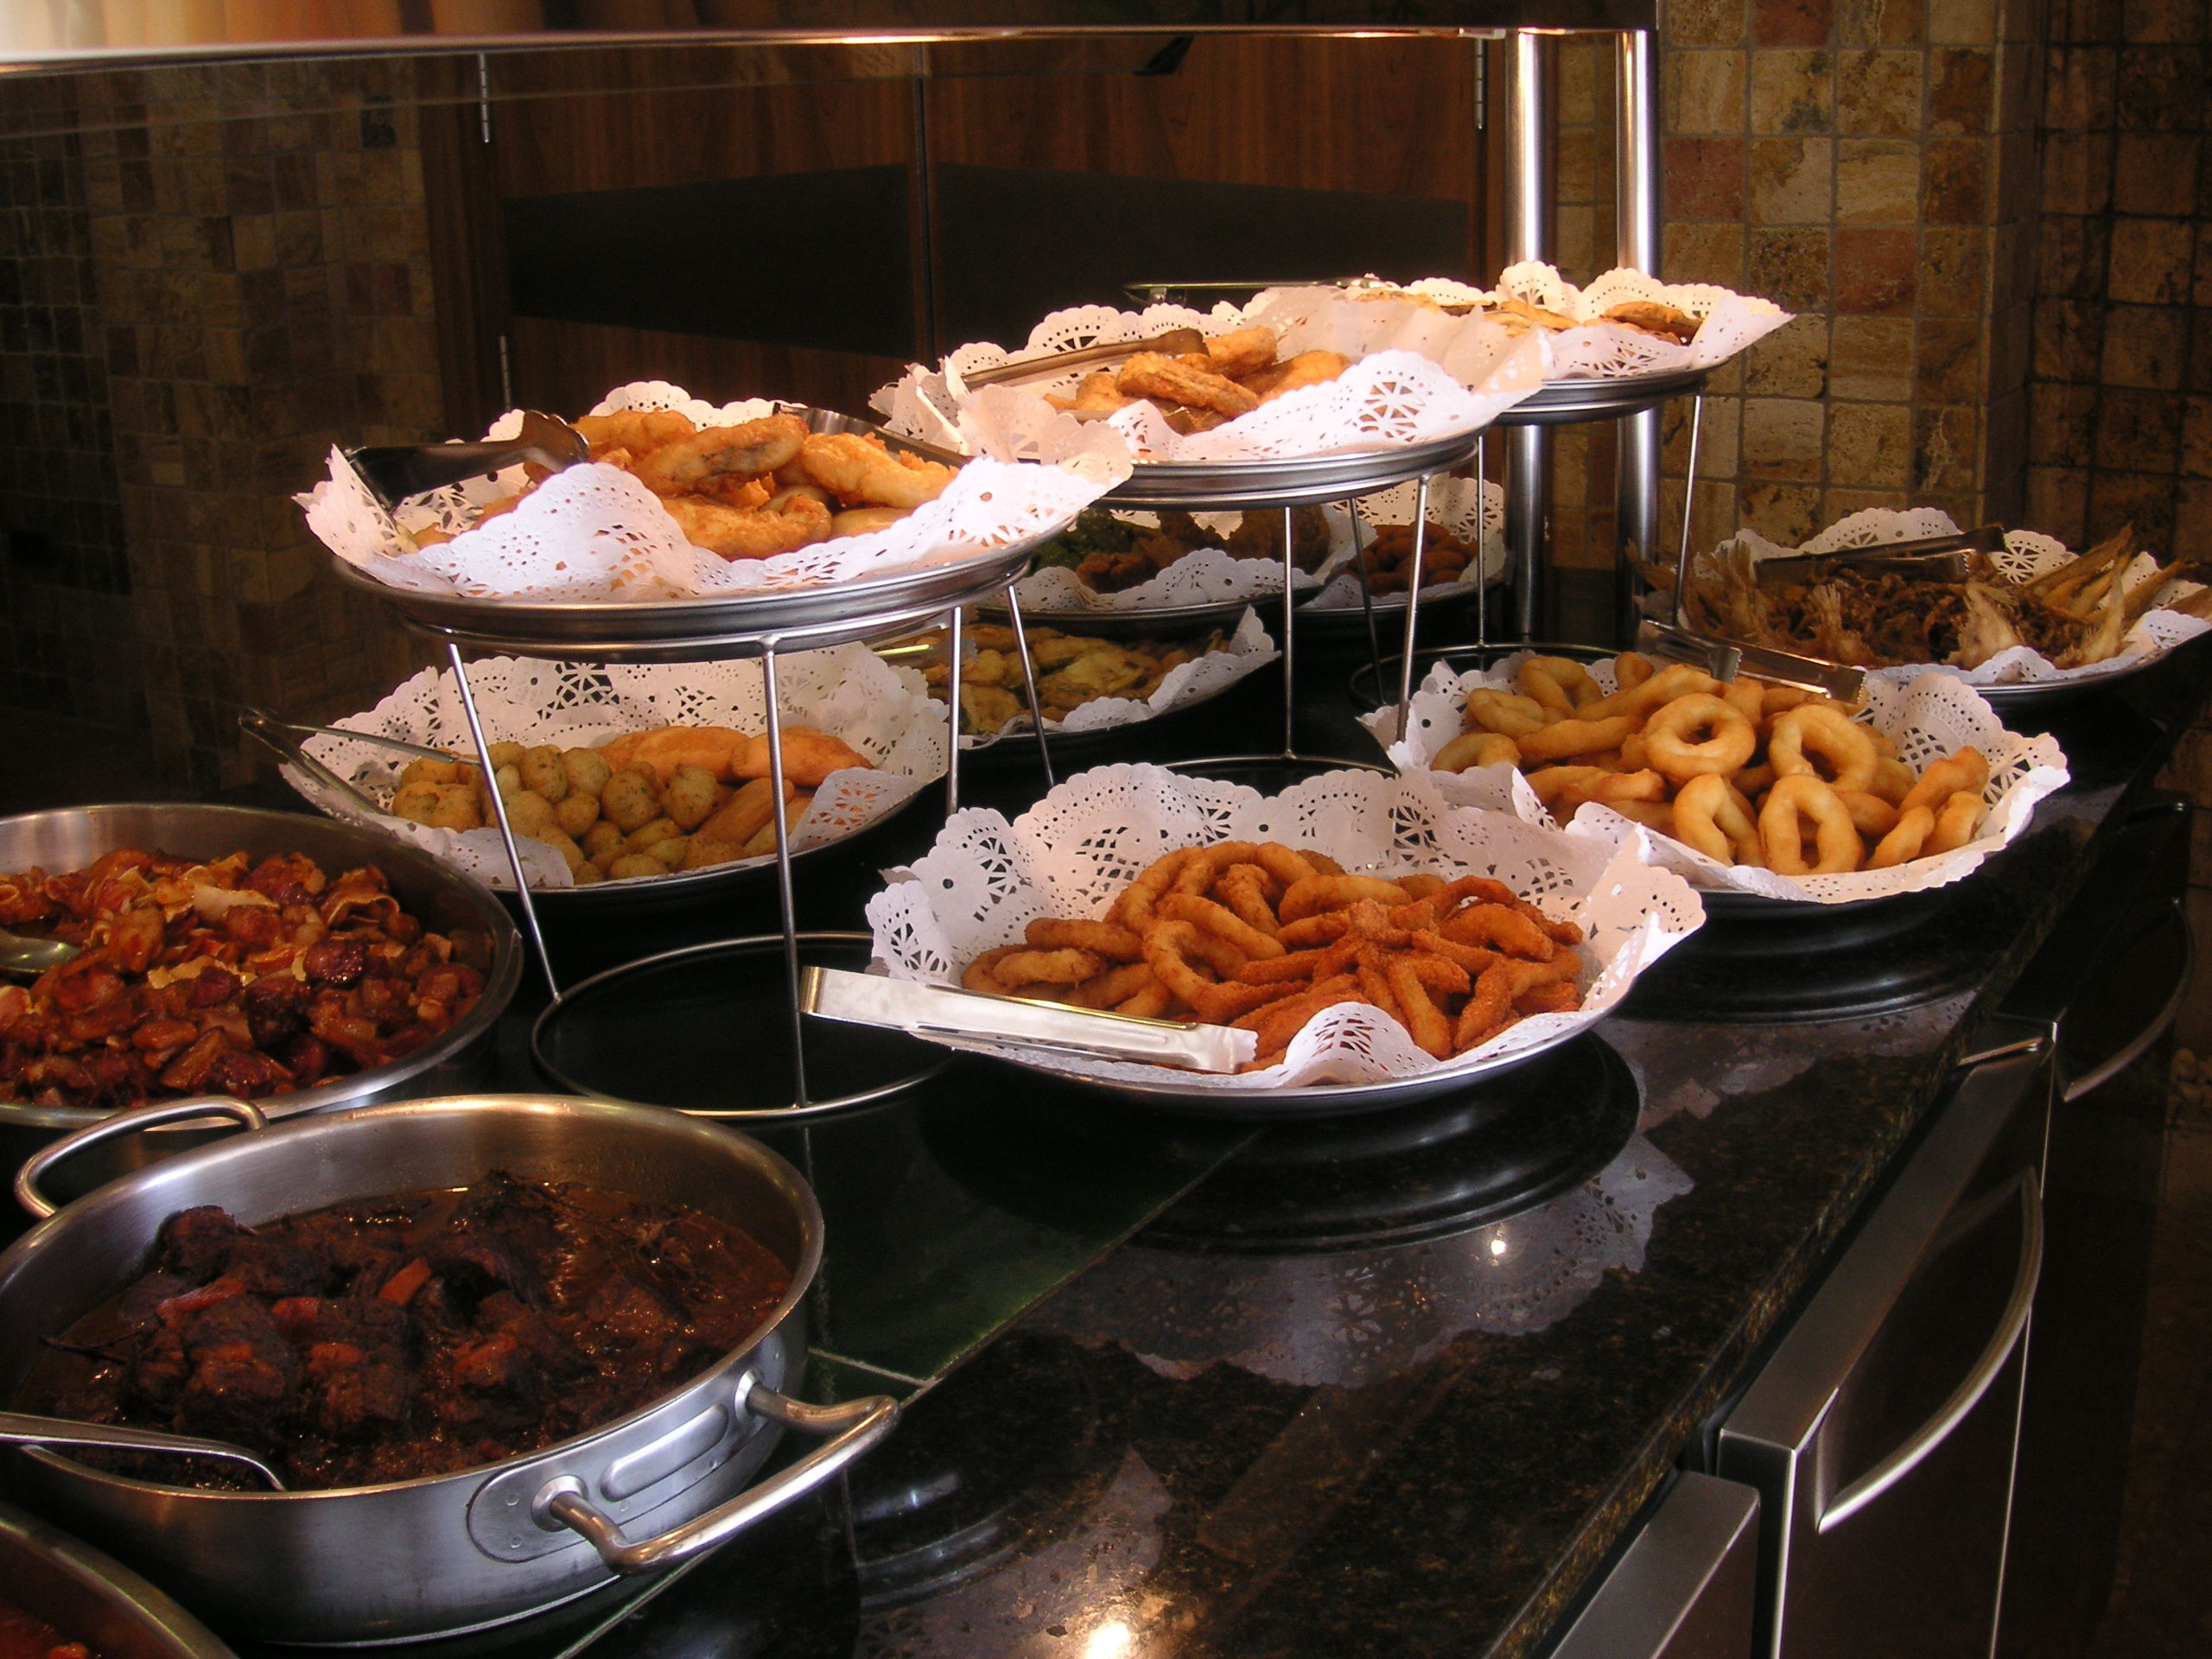 Picture 5 of Cocina mediterránea in Torredembarra | Restaurant Clamar